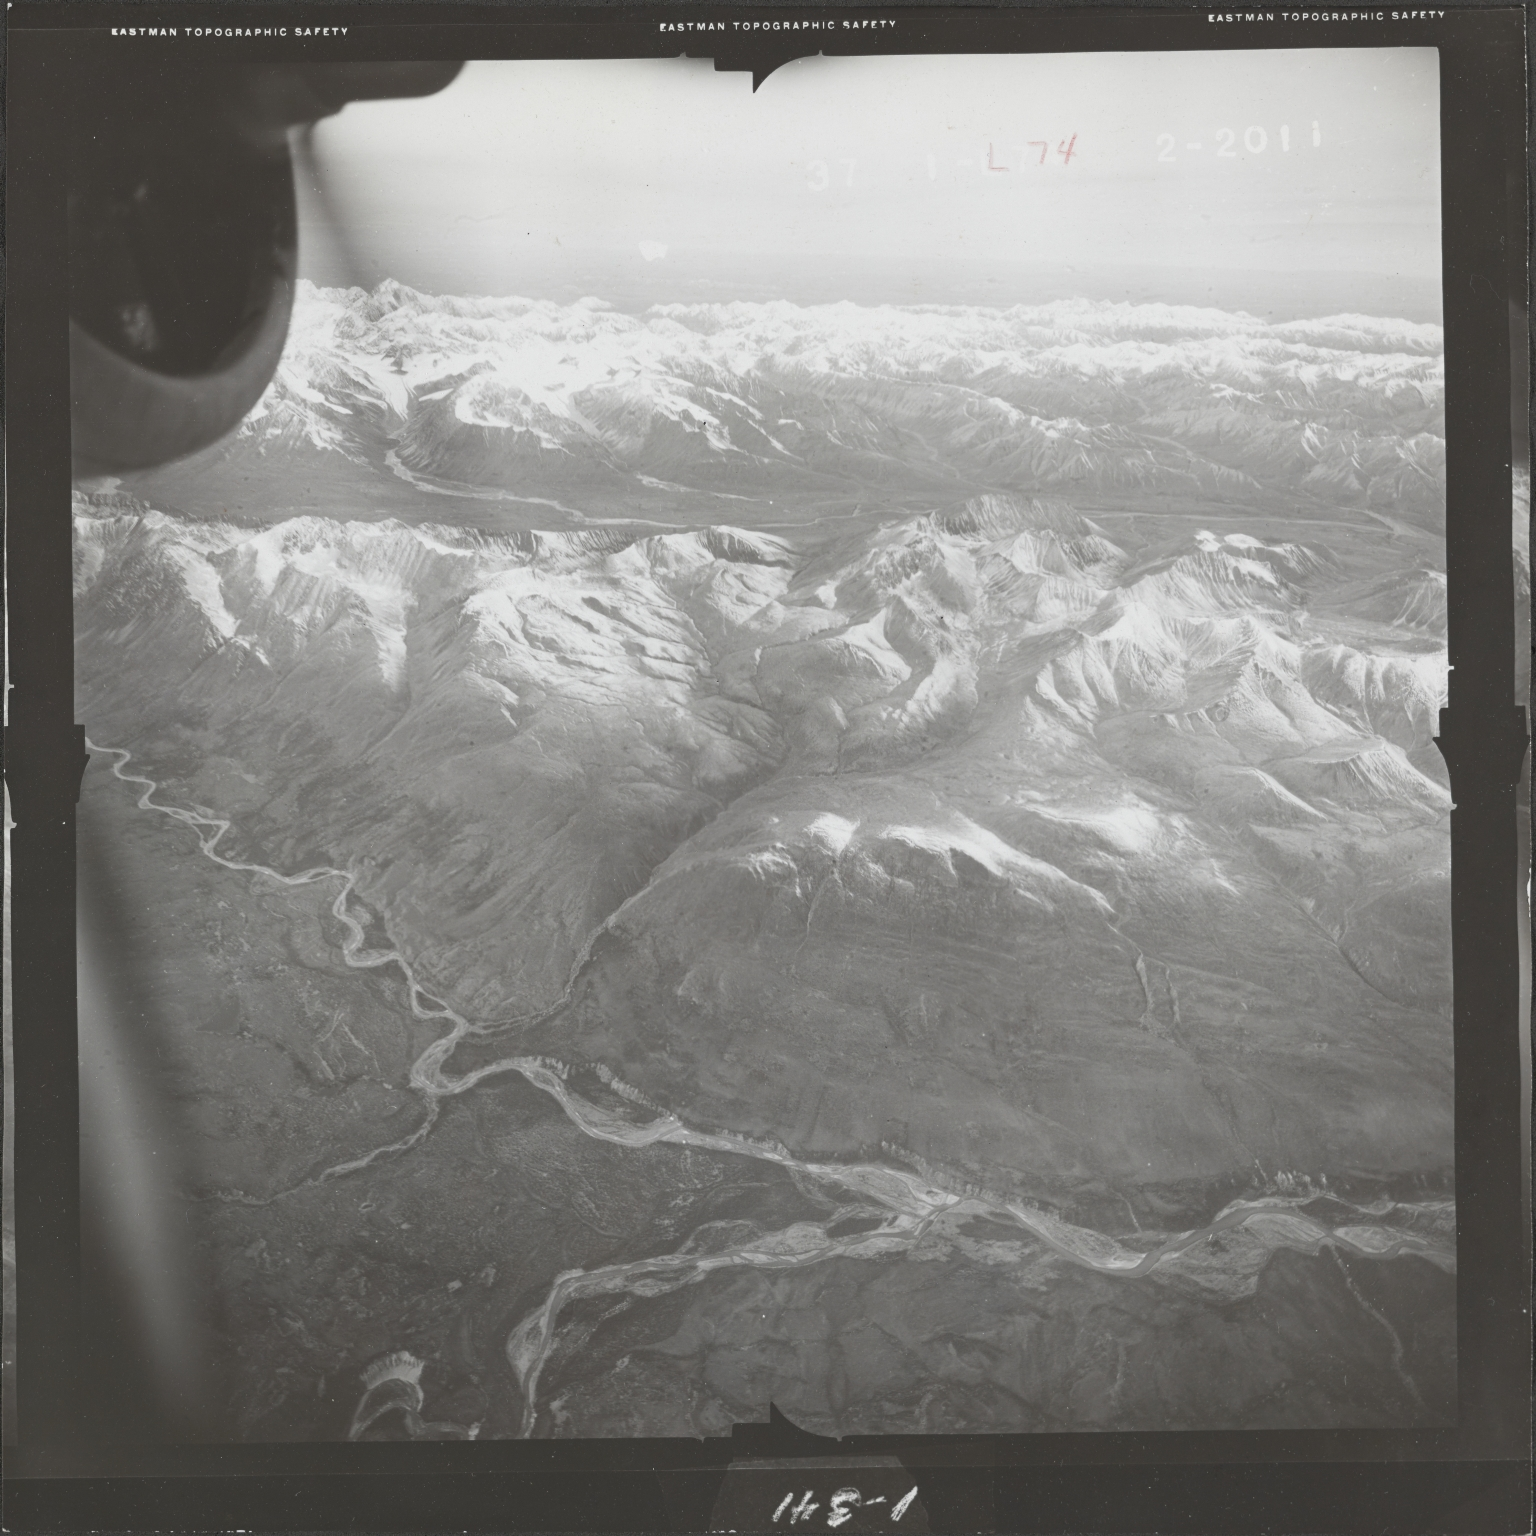 Alaska Range, aerial photograph FL 68 L-74, Alaska